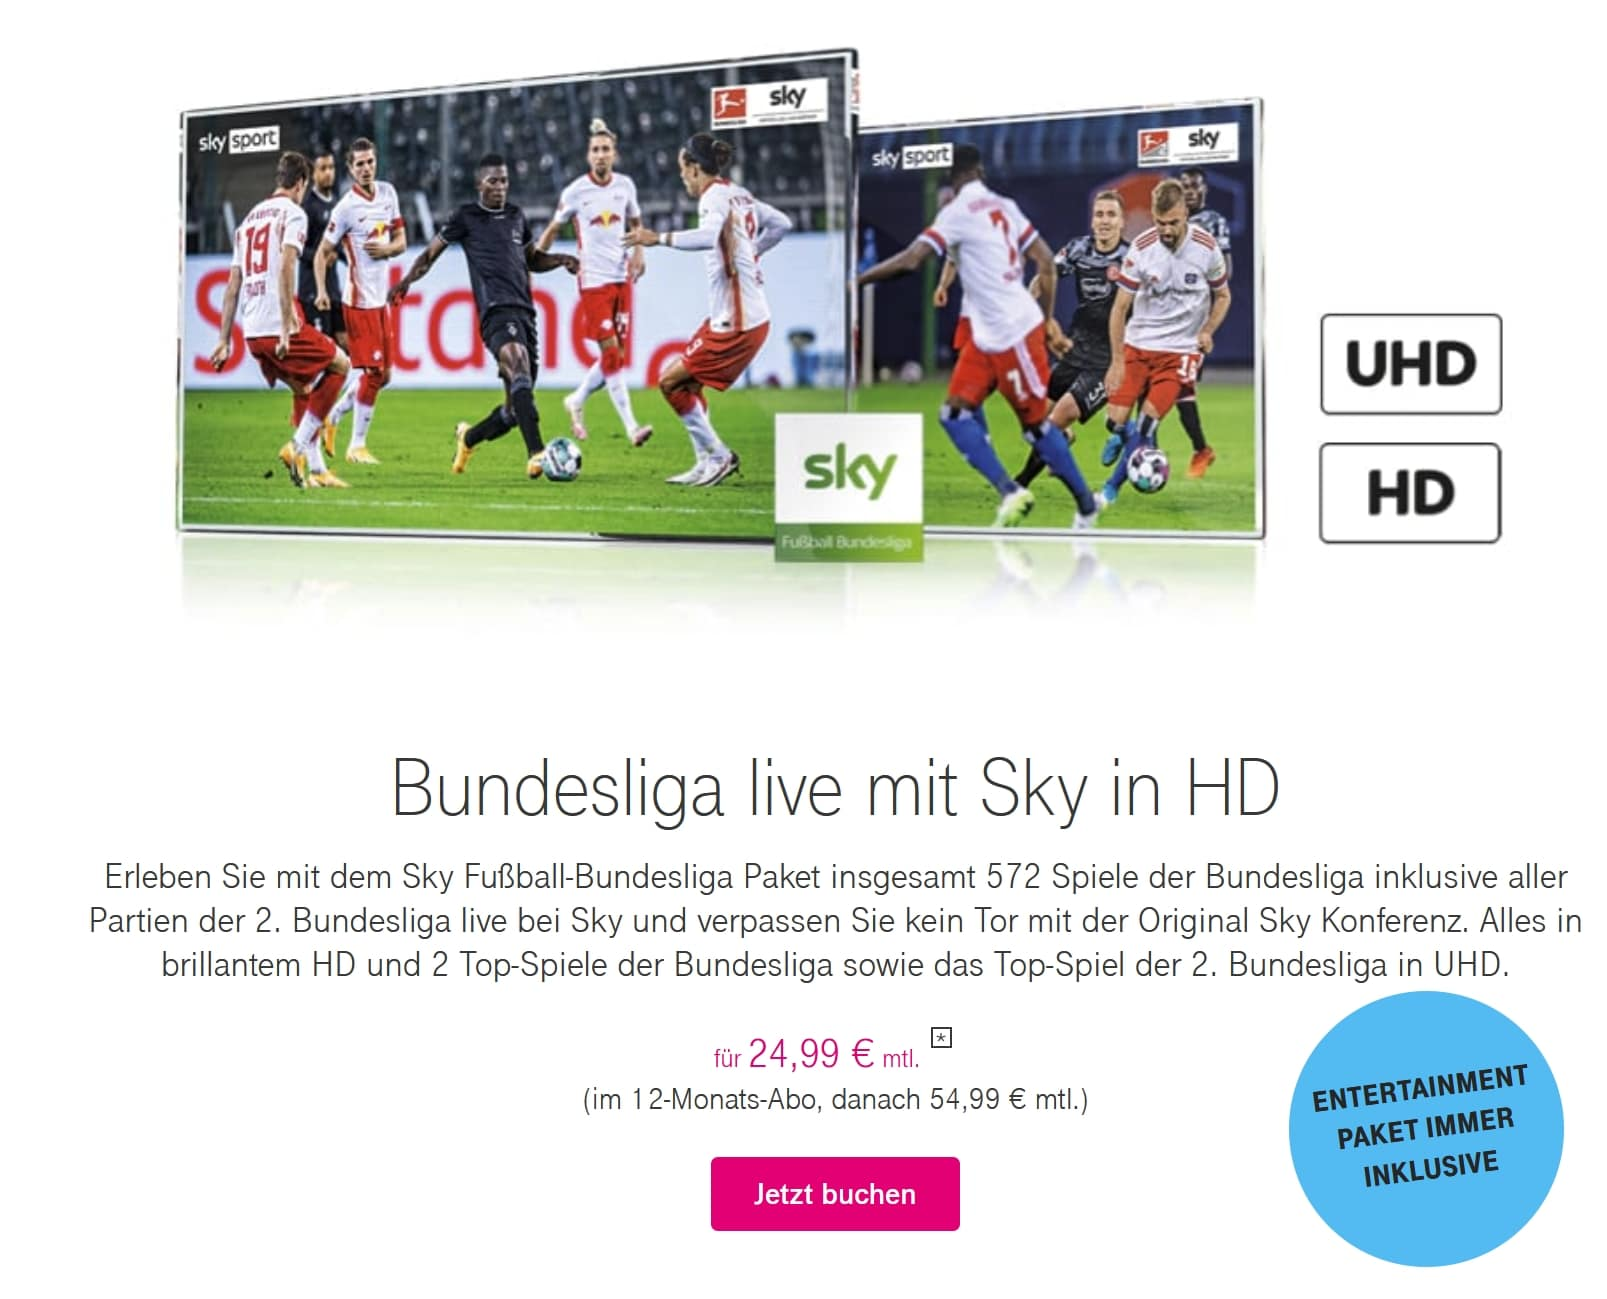 sky-entertain-telekom